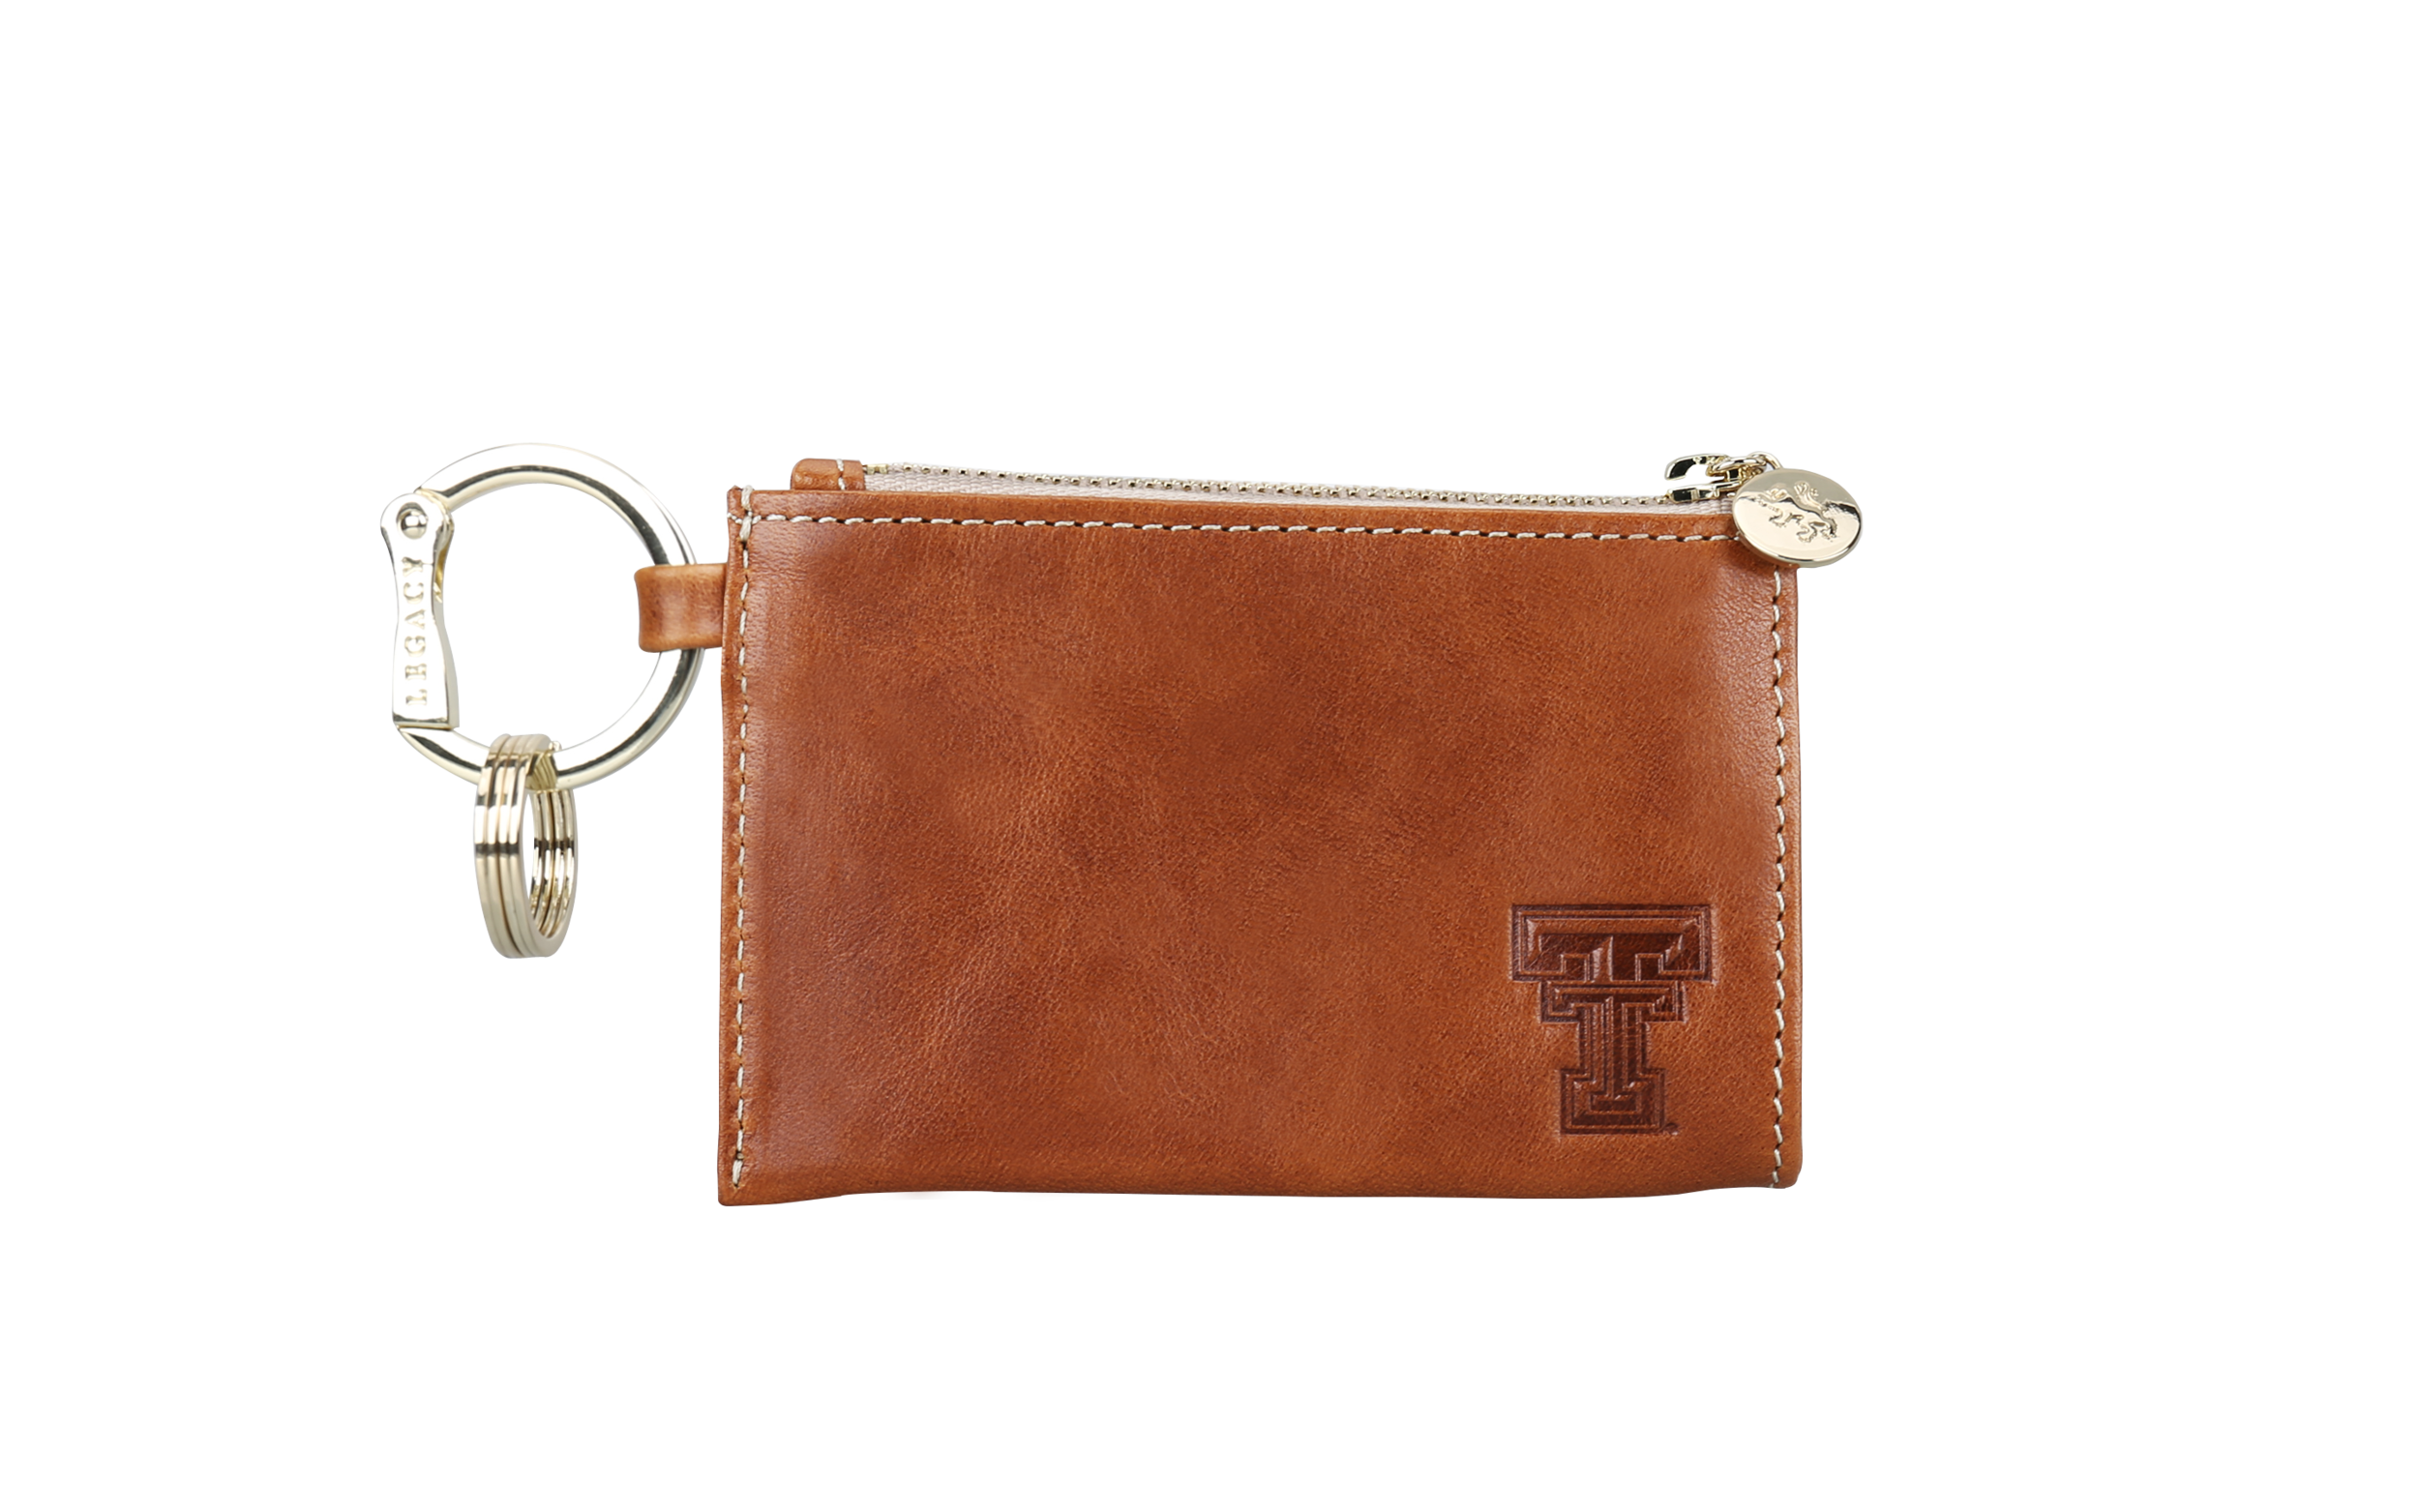 tx tech ladies wallet.png